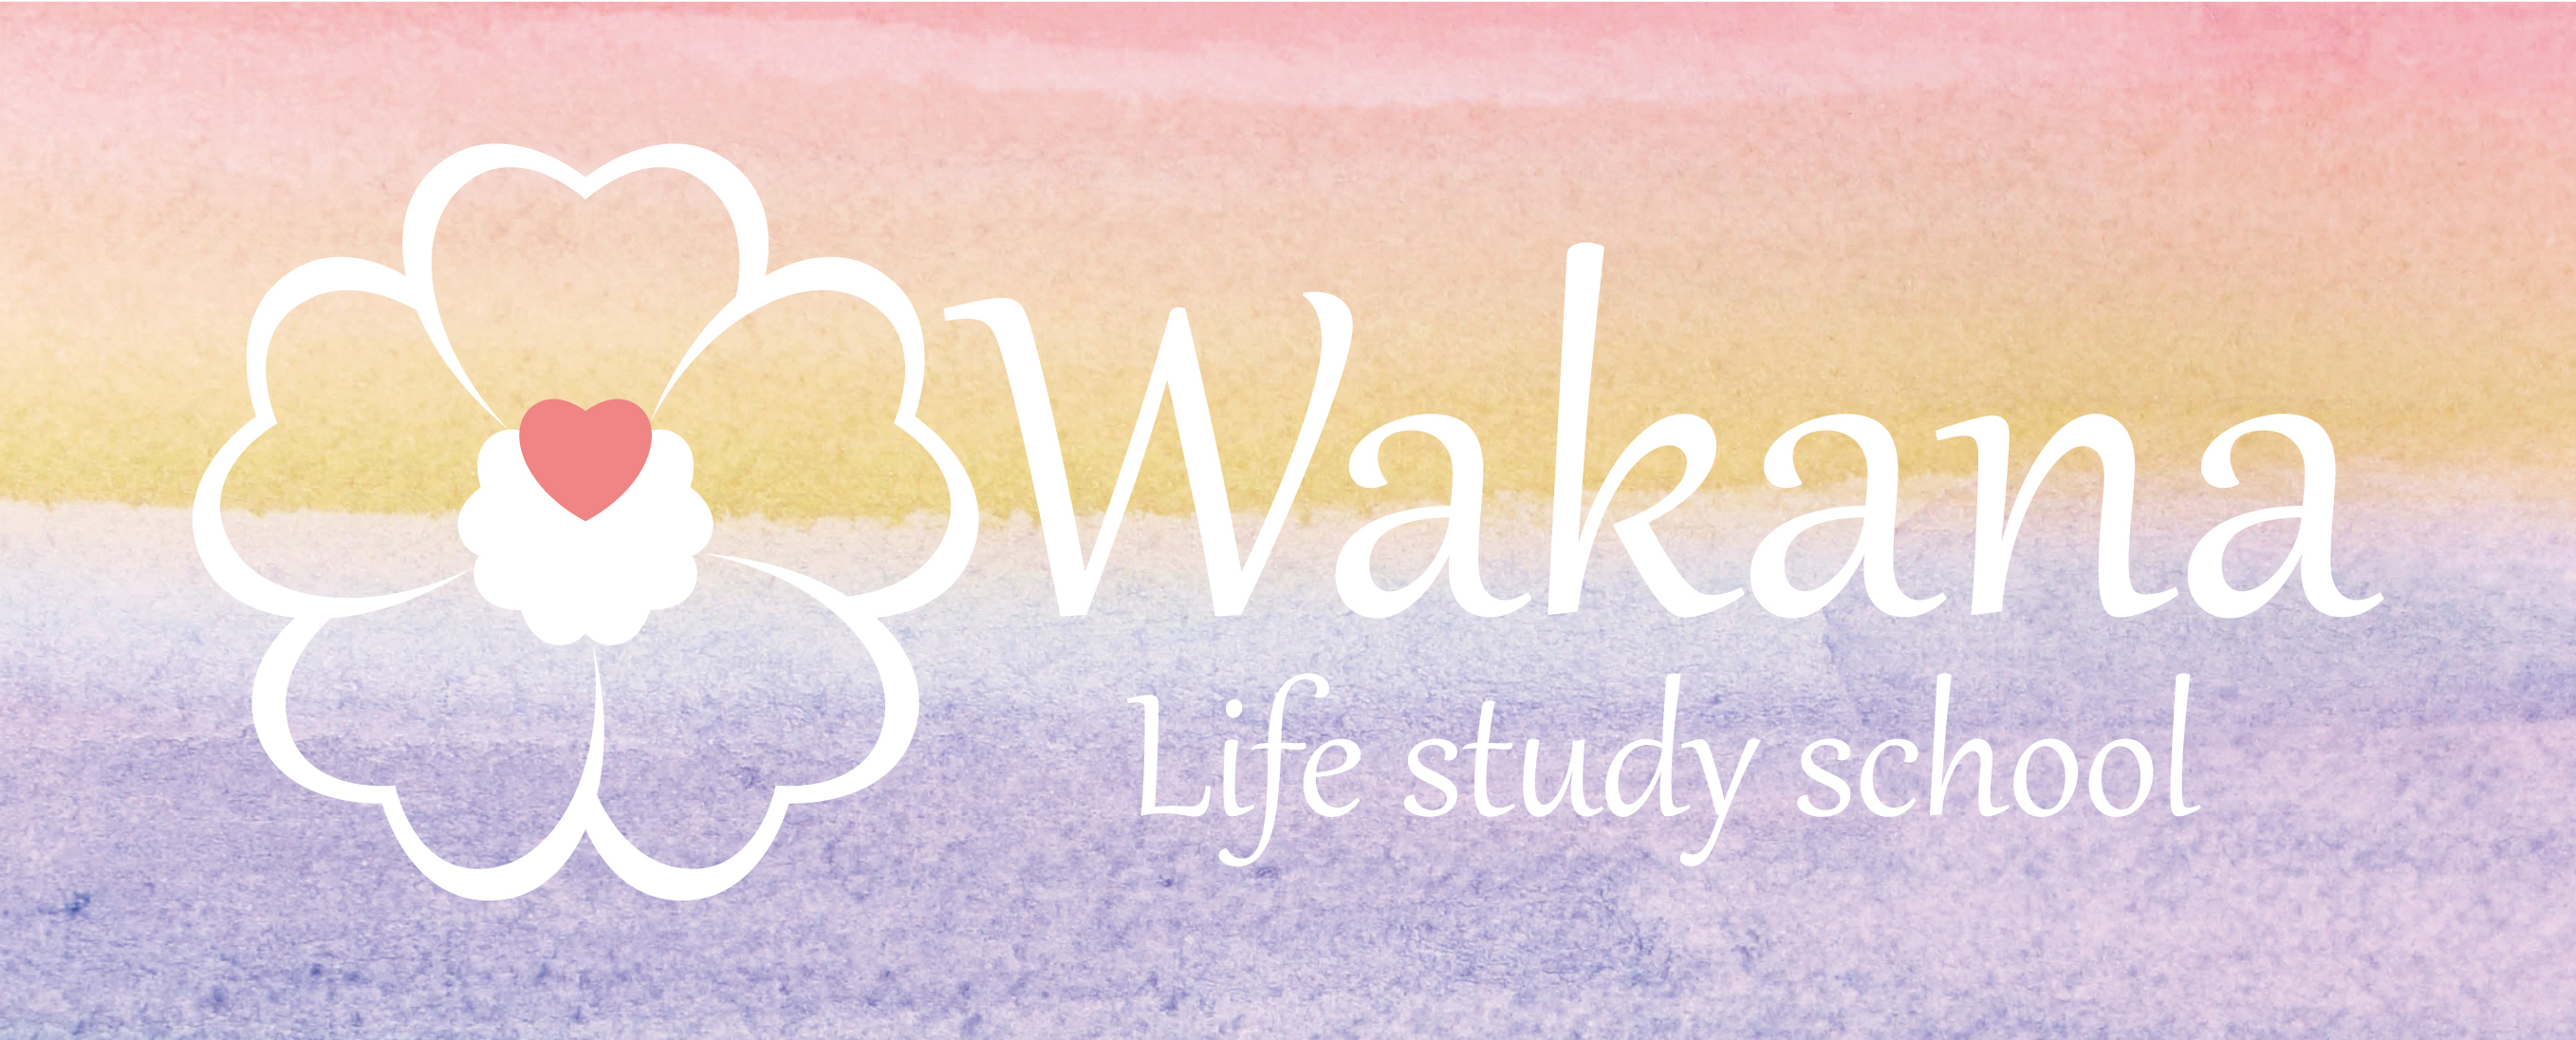 Life study school Wakana